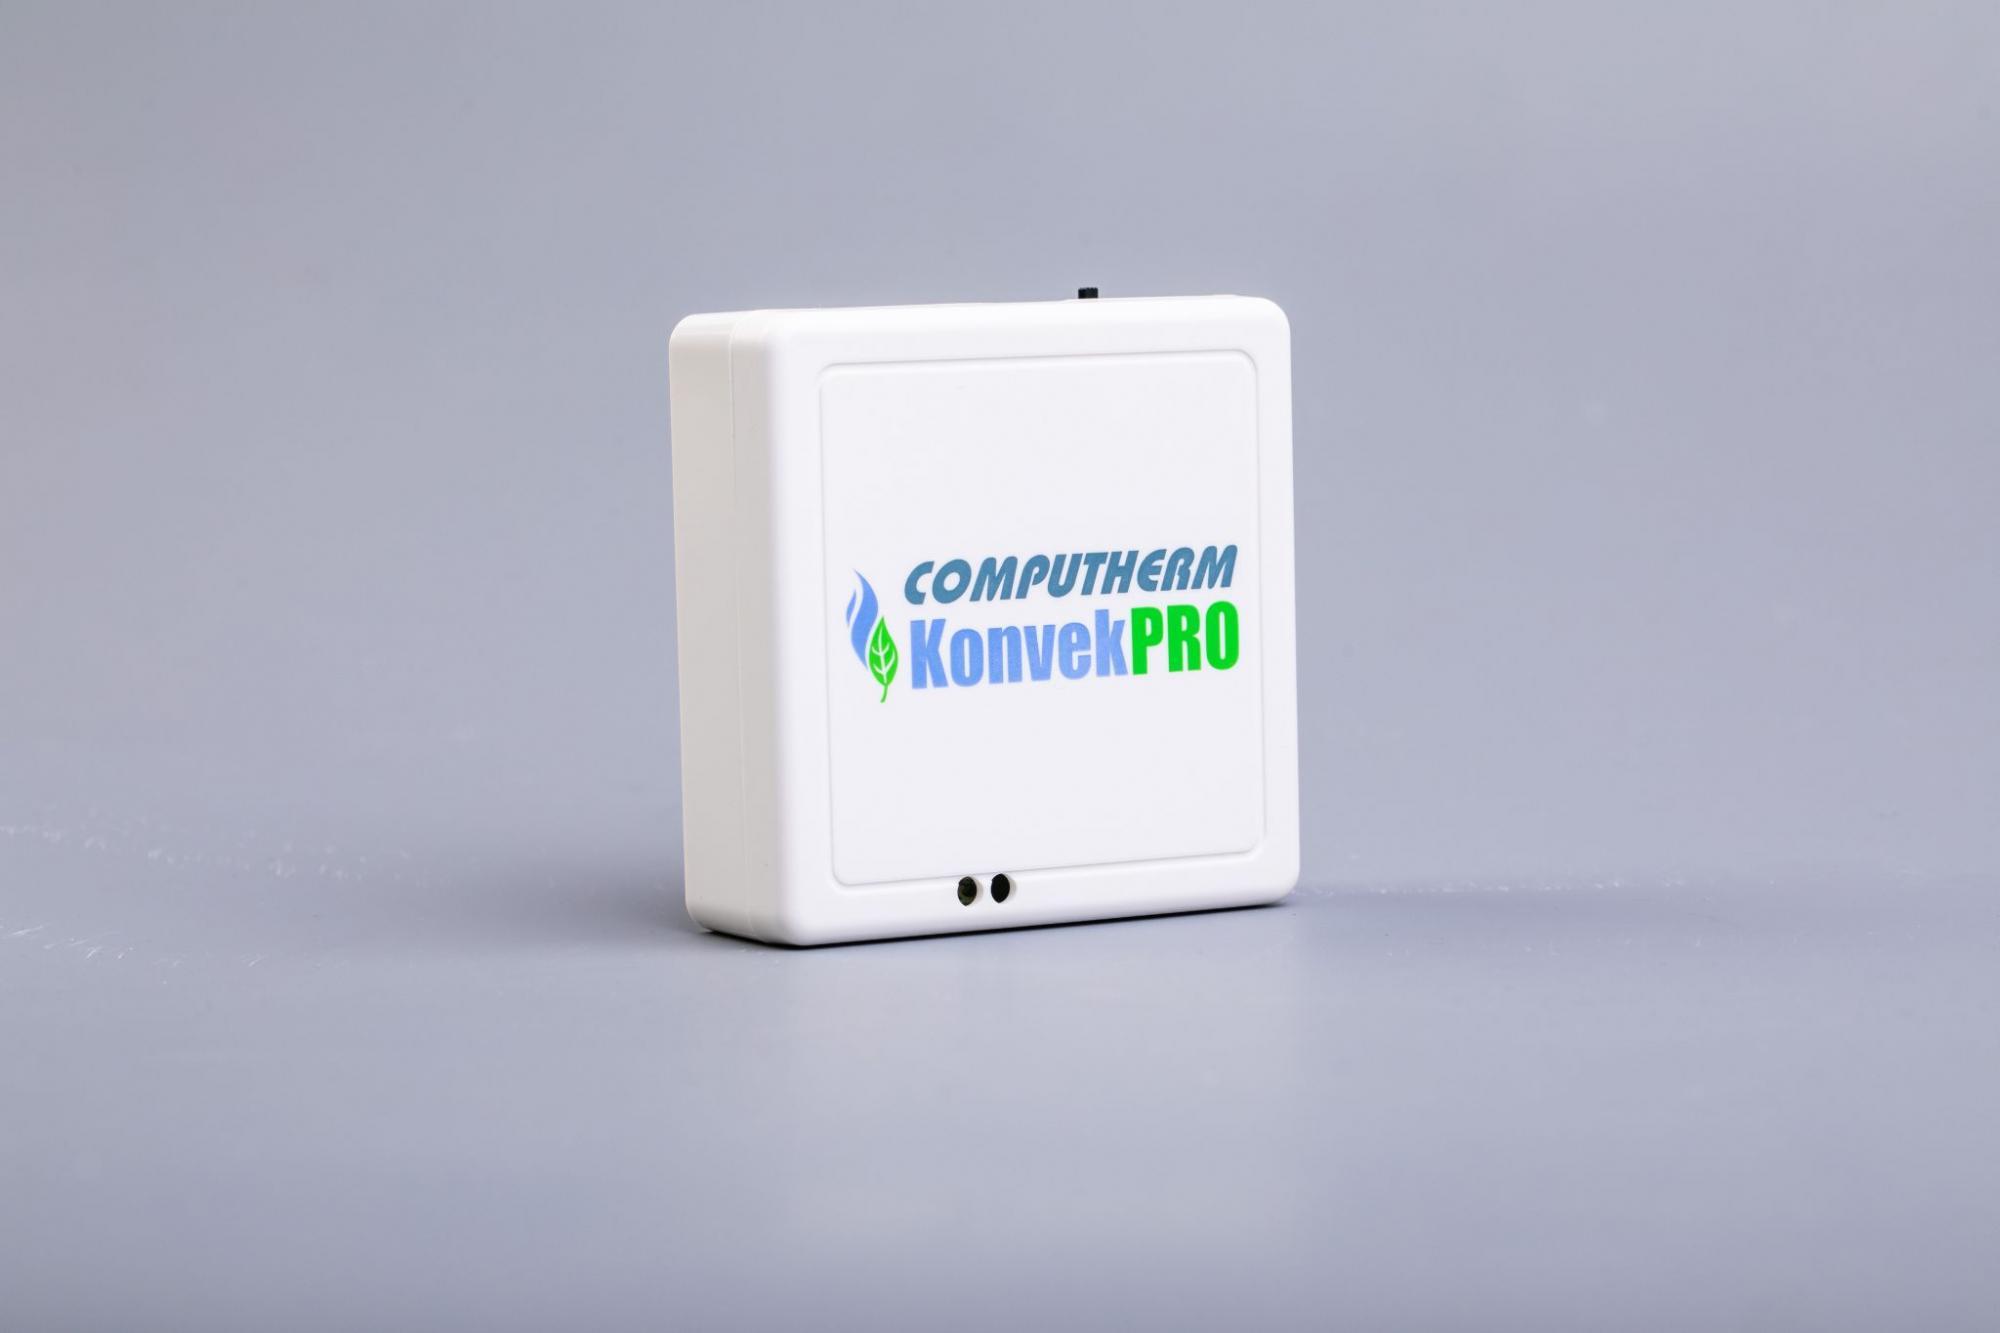 Computherm - Gázkonvektor vezérlők - COMPUTHERM KonvekPRO - Quantrax Kft.